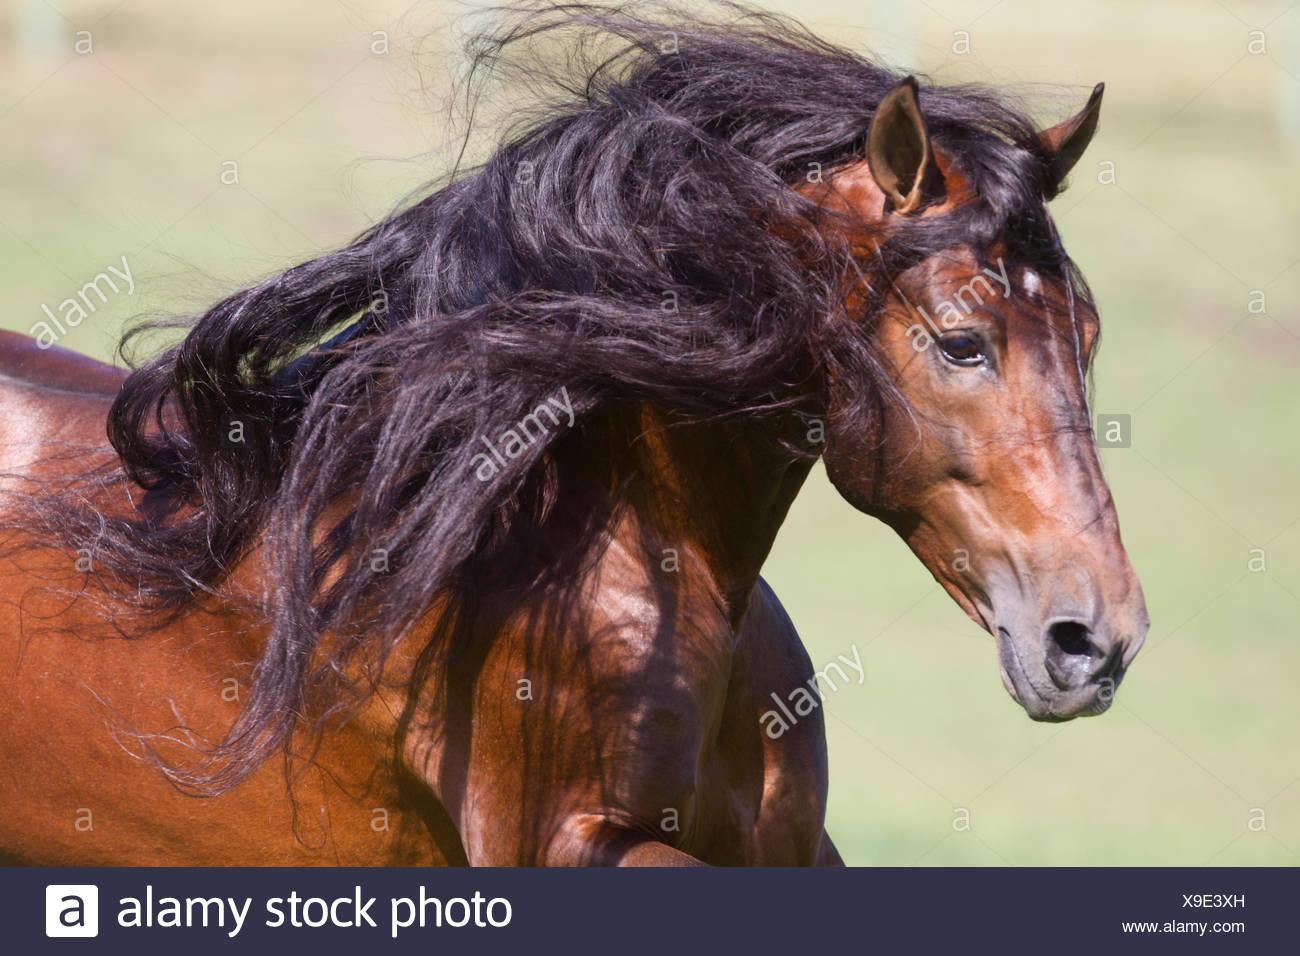 Bay Andalusian stallion running. Ojai, California, USA. - Stock Image